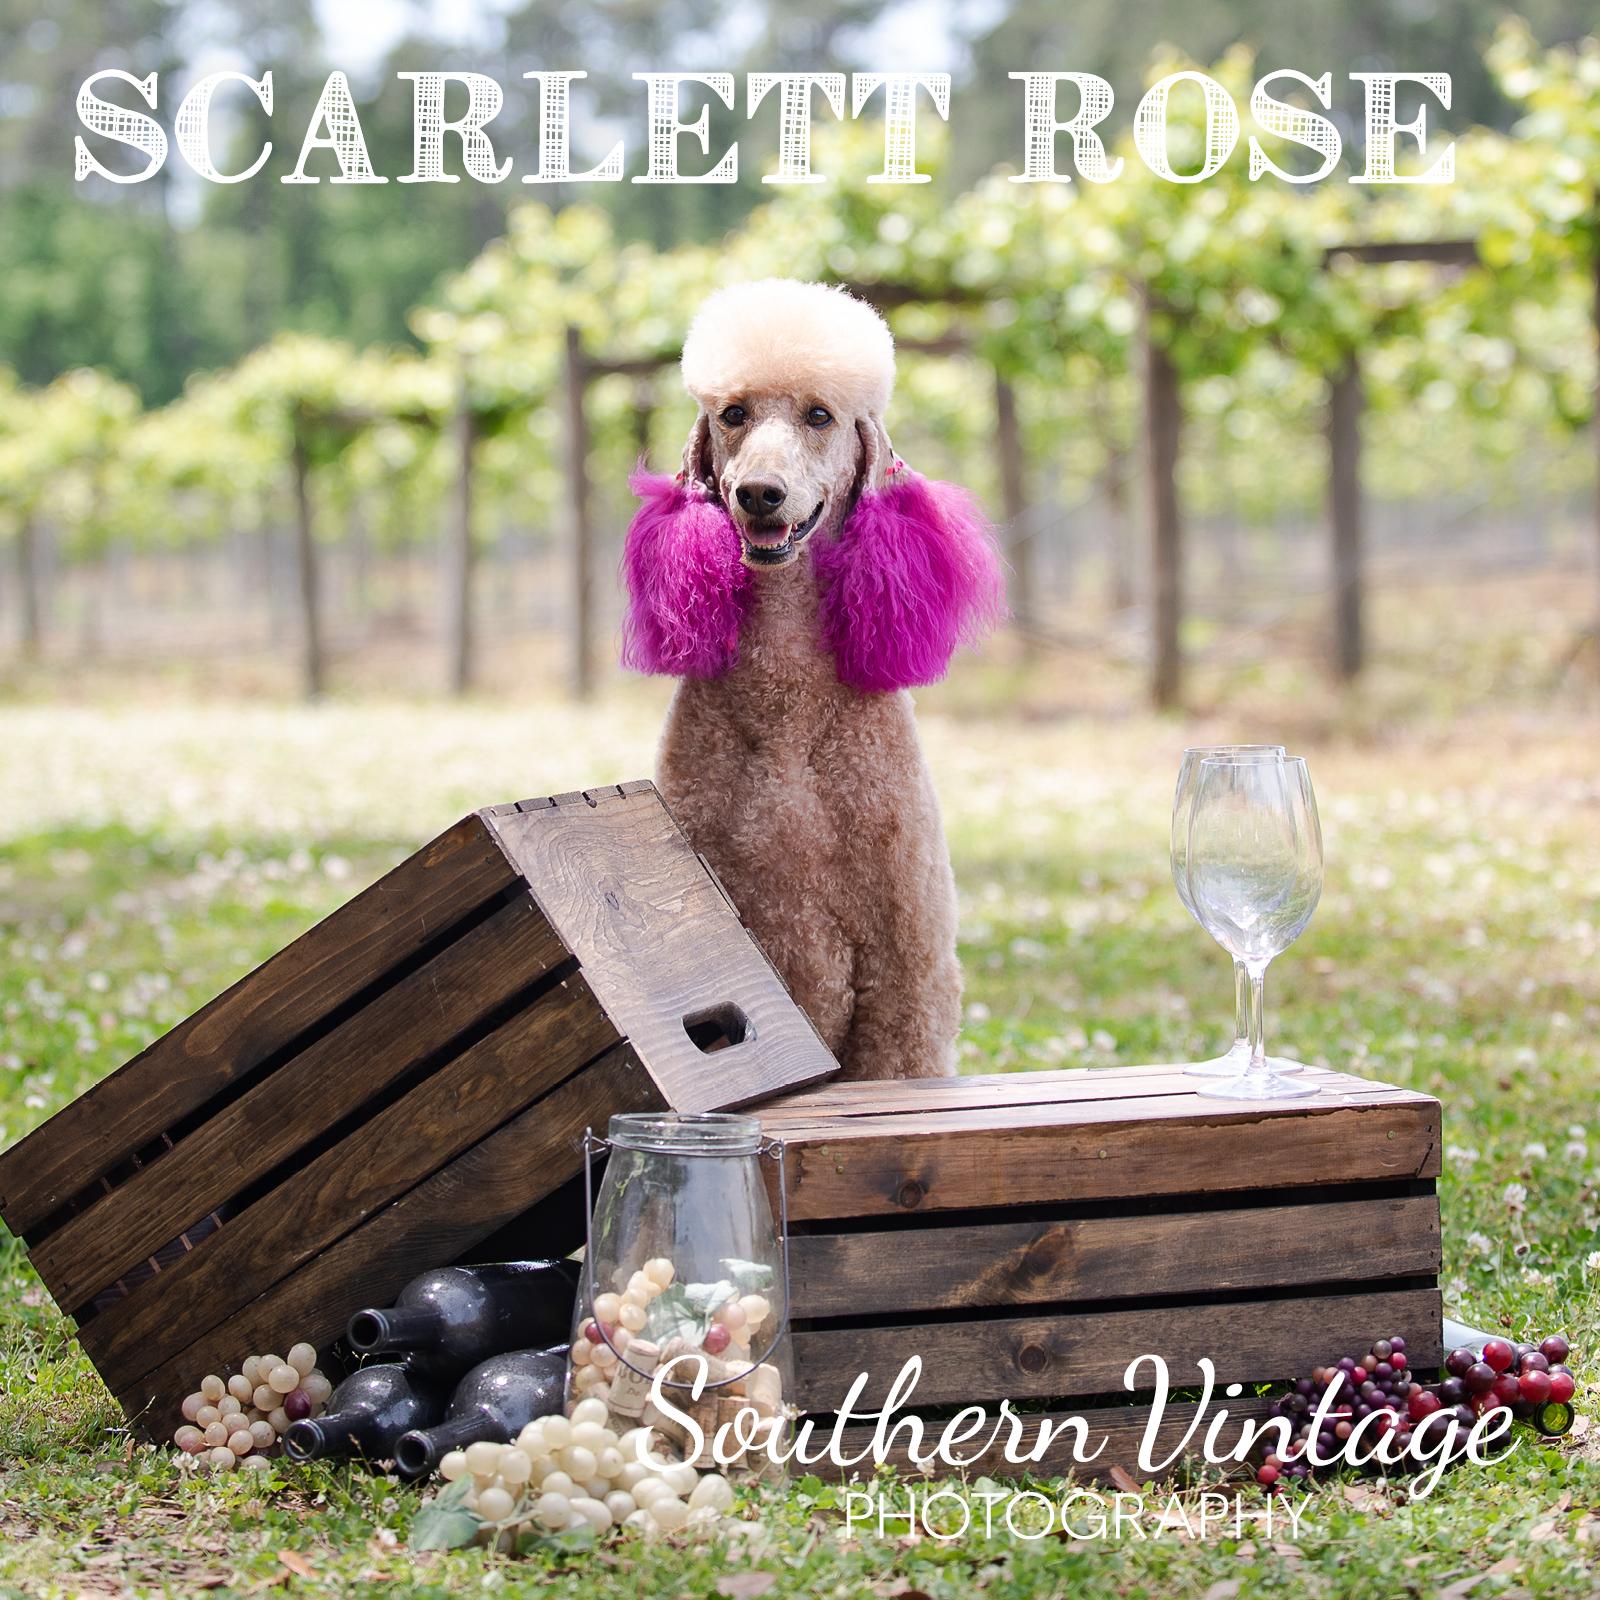 14_ScarlettRose.jpg